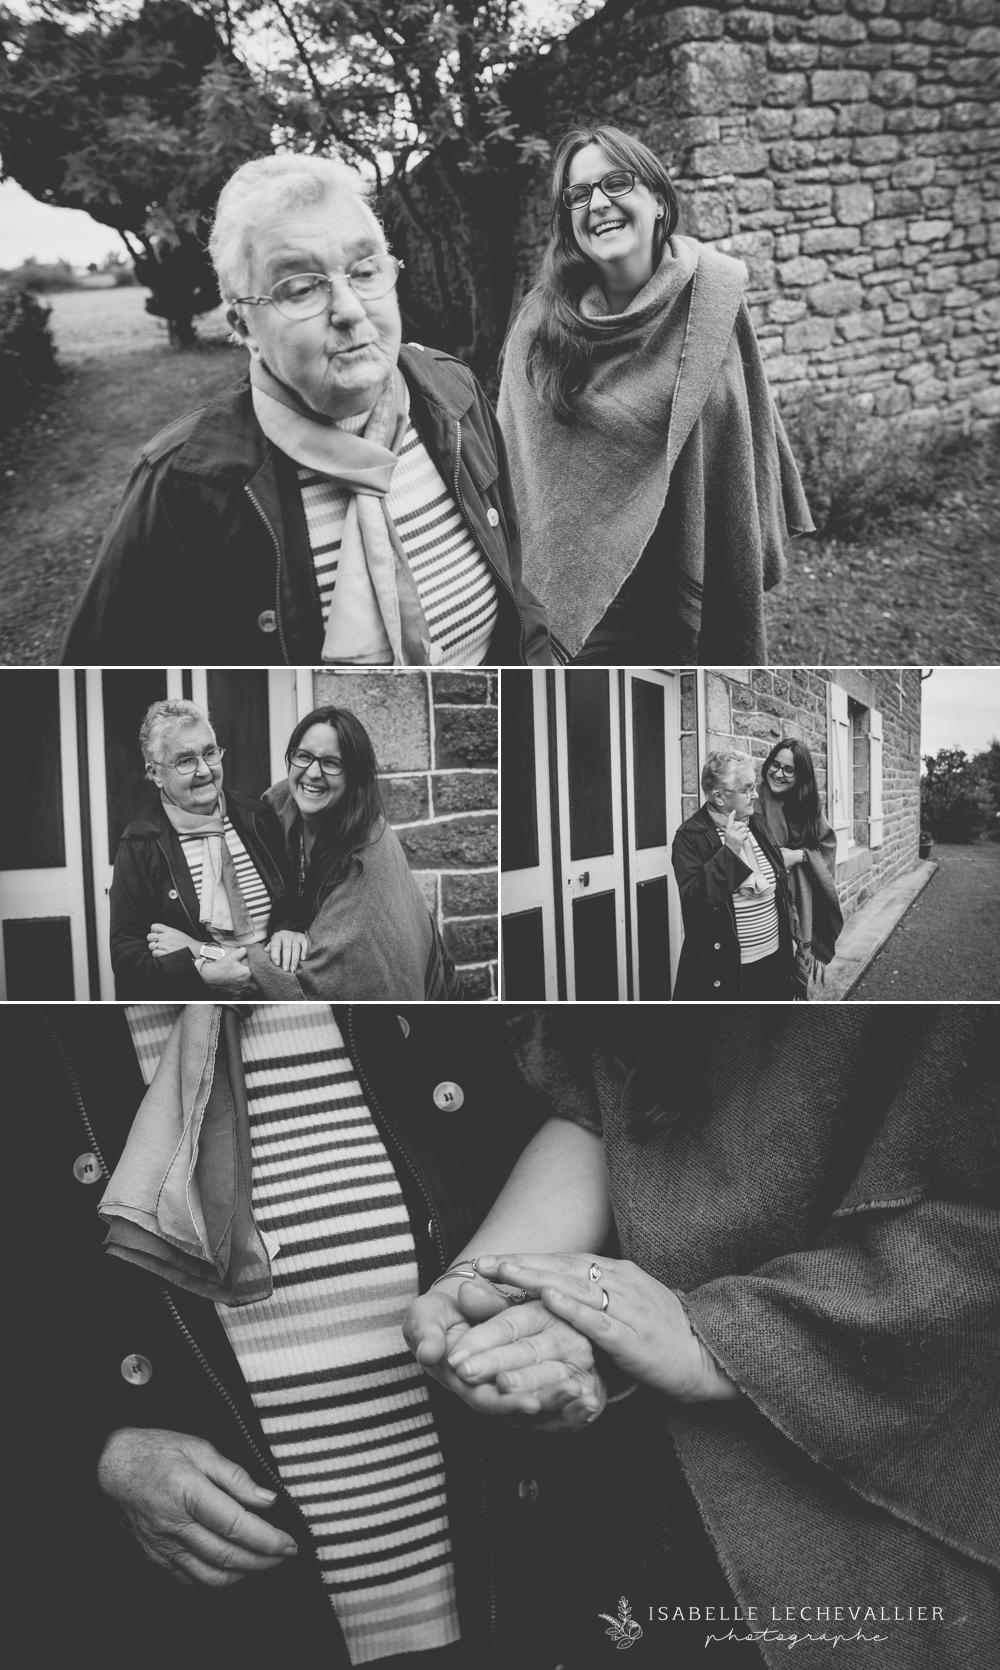 Souvenirs photos avec sa grand-mère